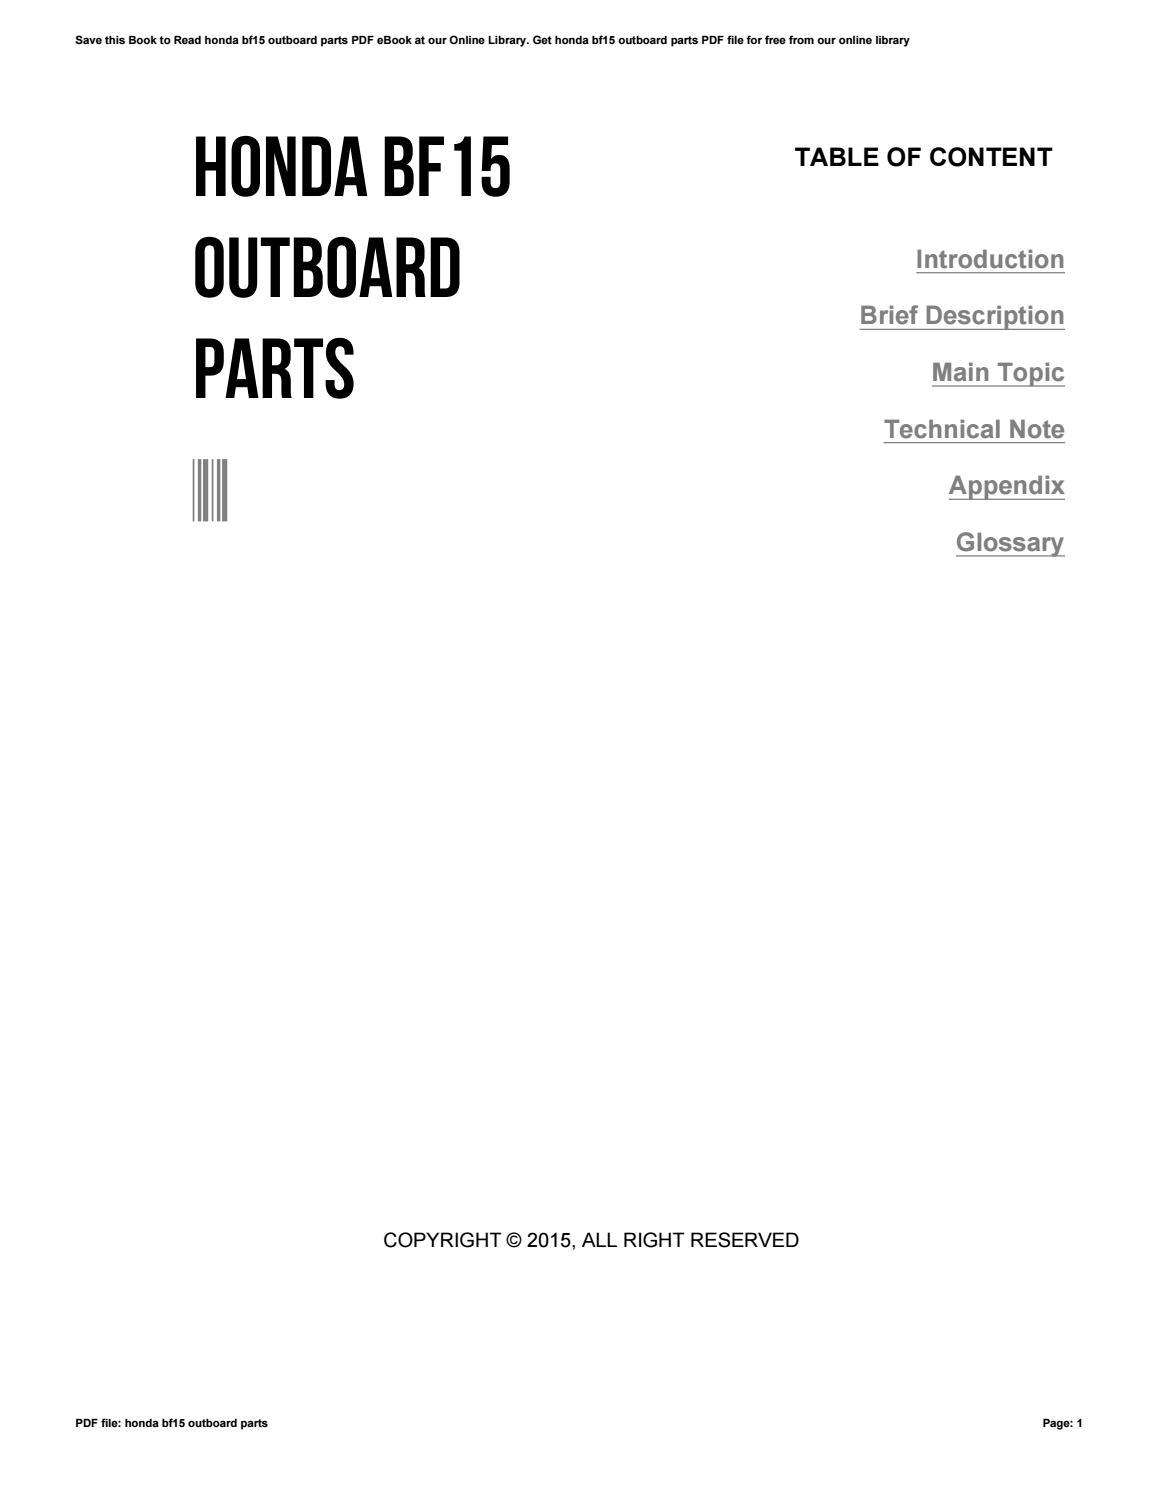 Honda Bf15 Outboard Parts By Caseedu234 Issuu Wiring Diagram